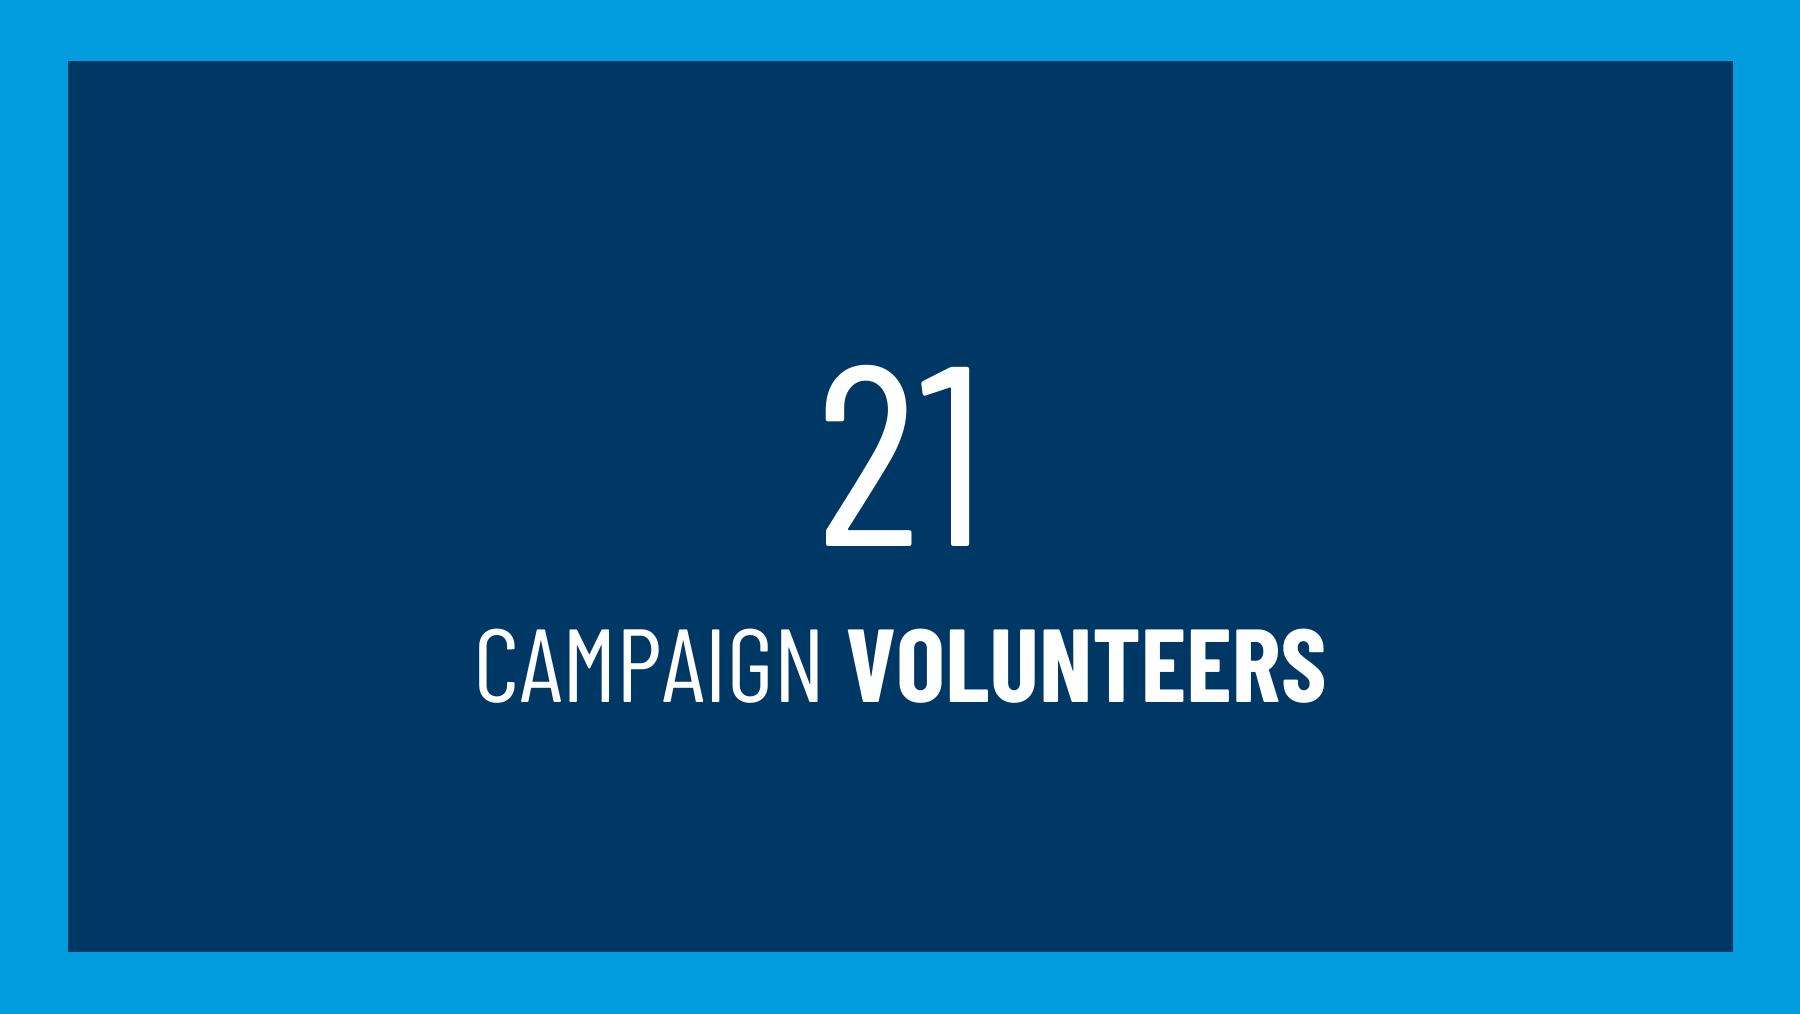 21 campaign volunteers